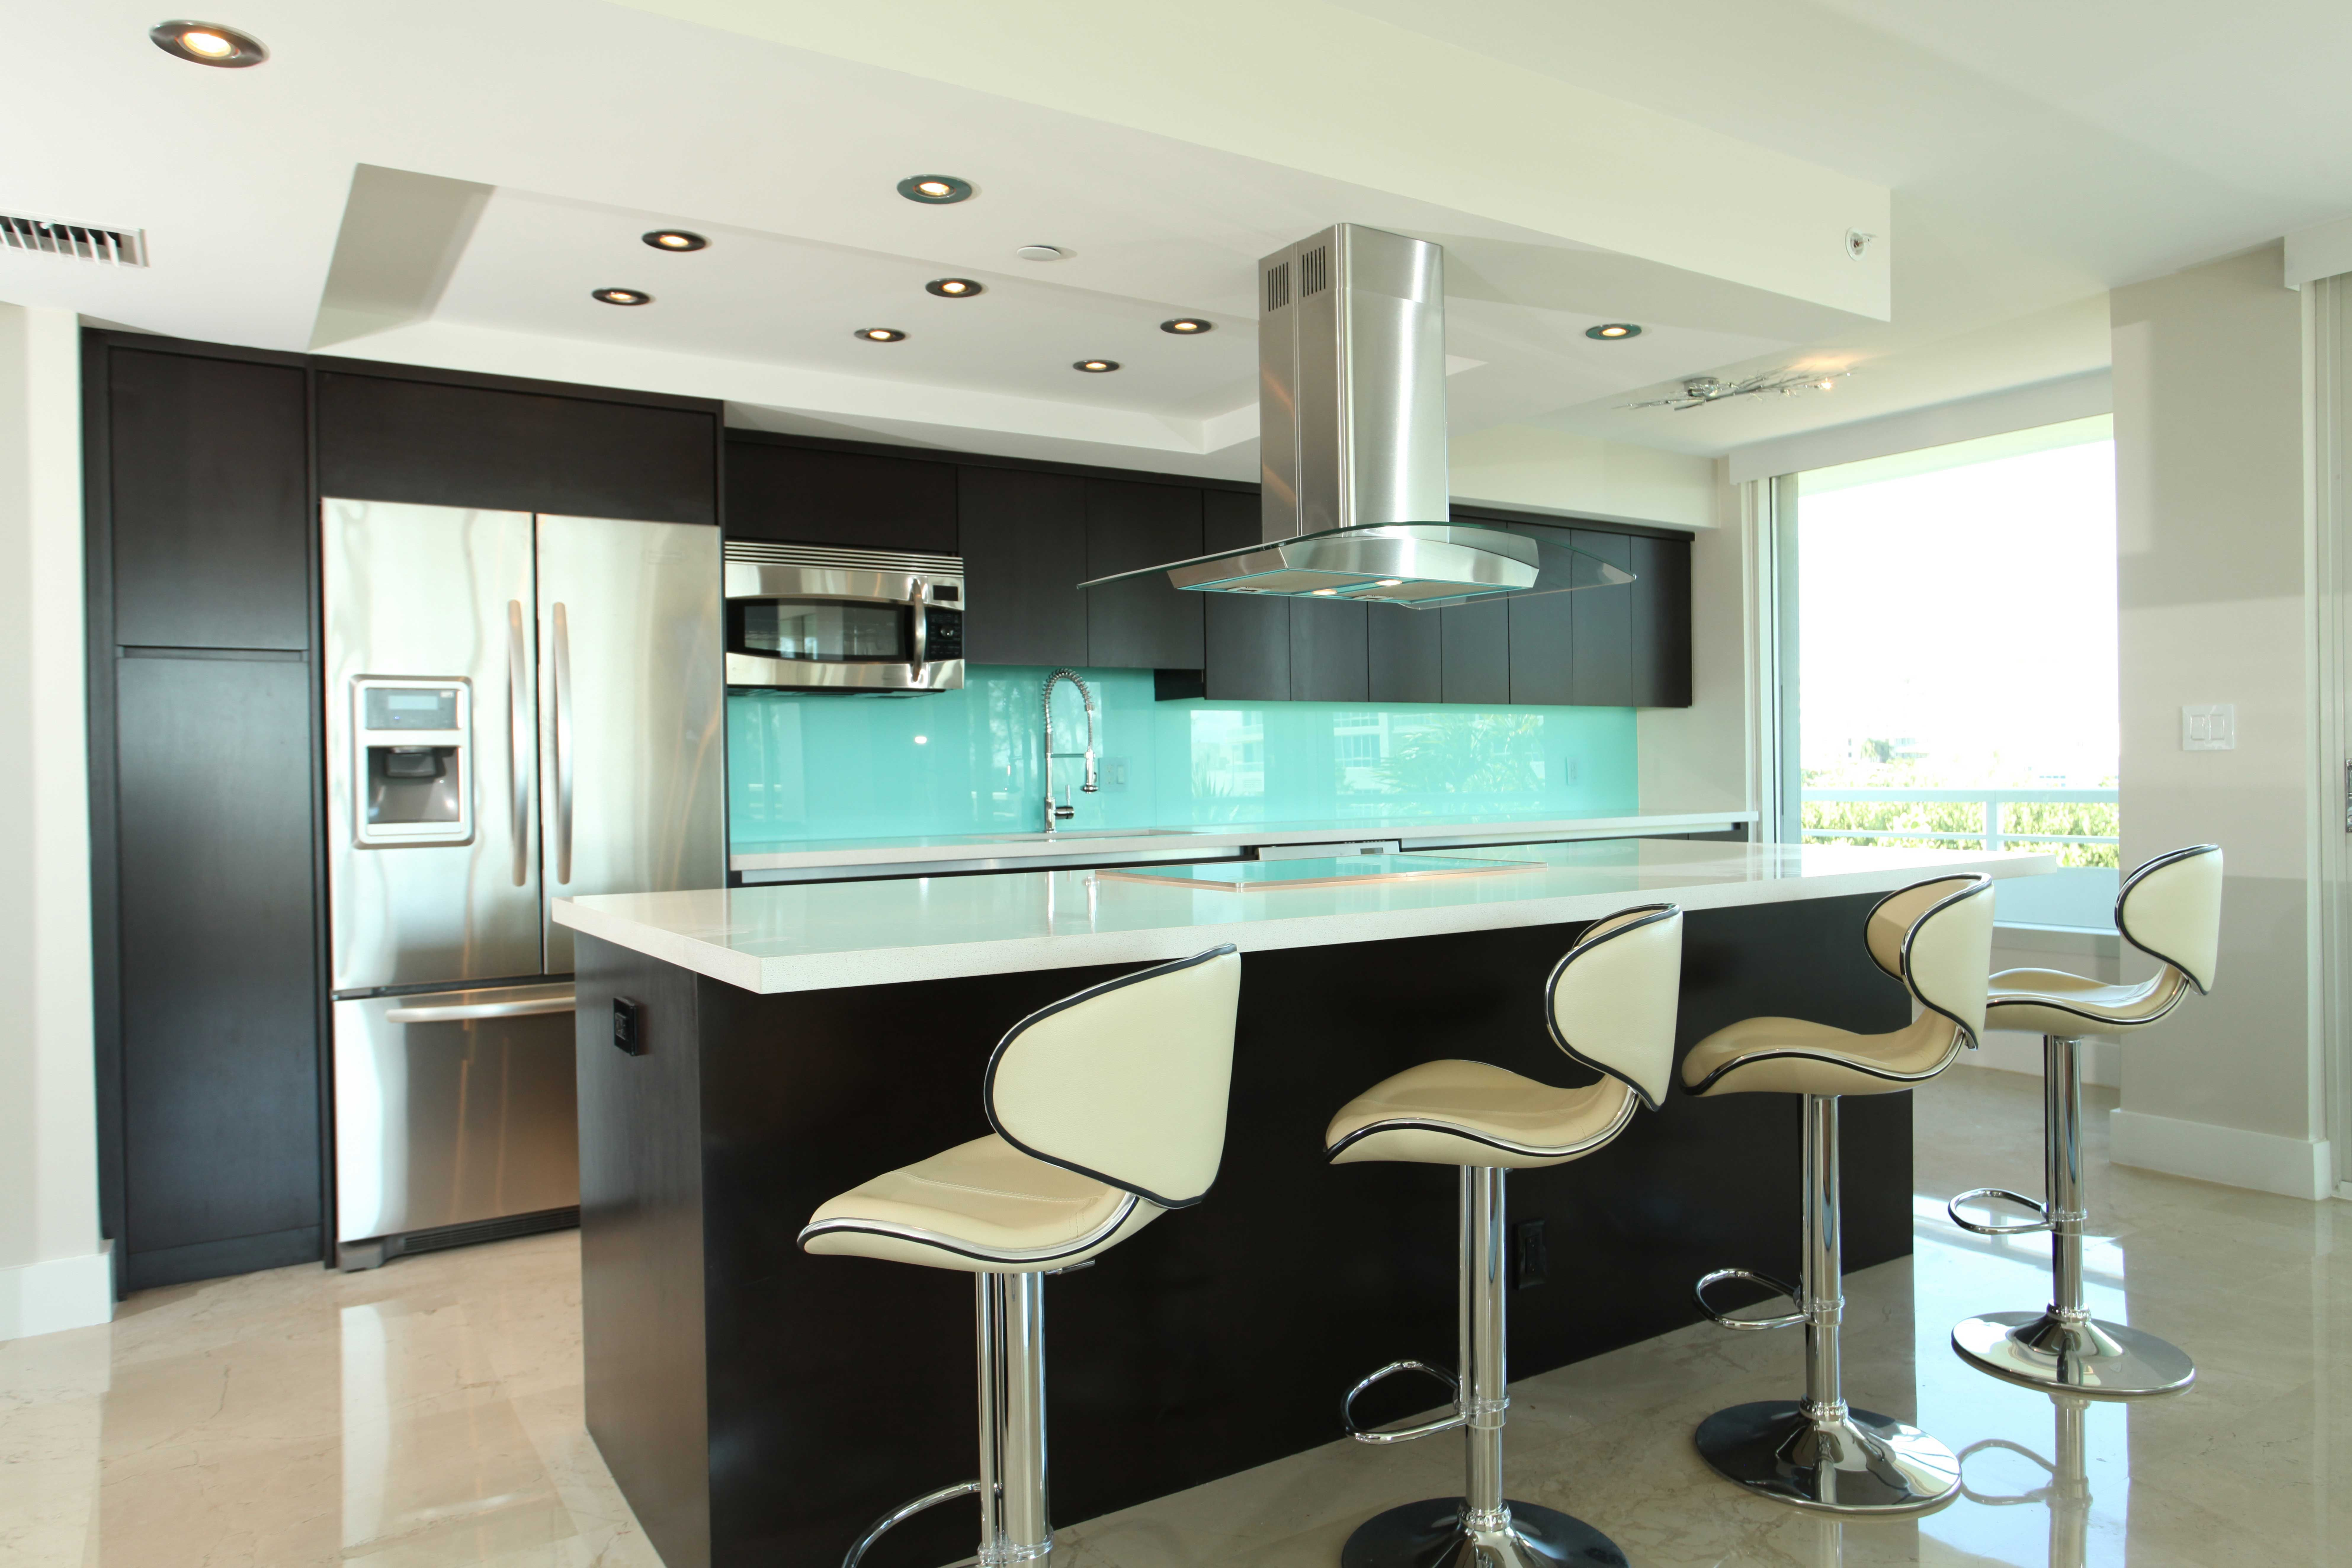 Best Kitchen Splashback Ideas & Cool Tile Decoration That Make You ...